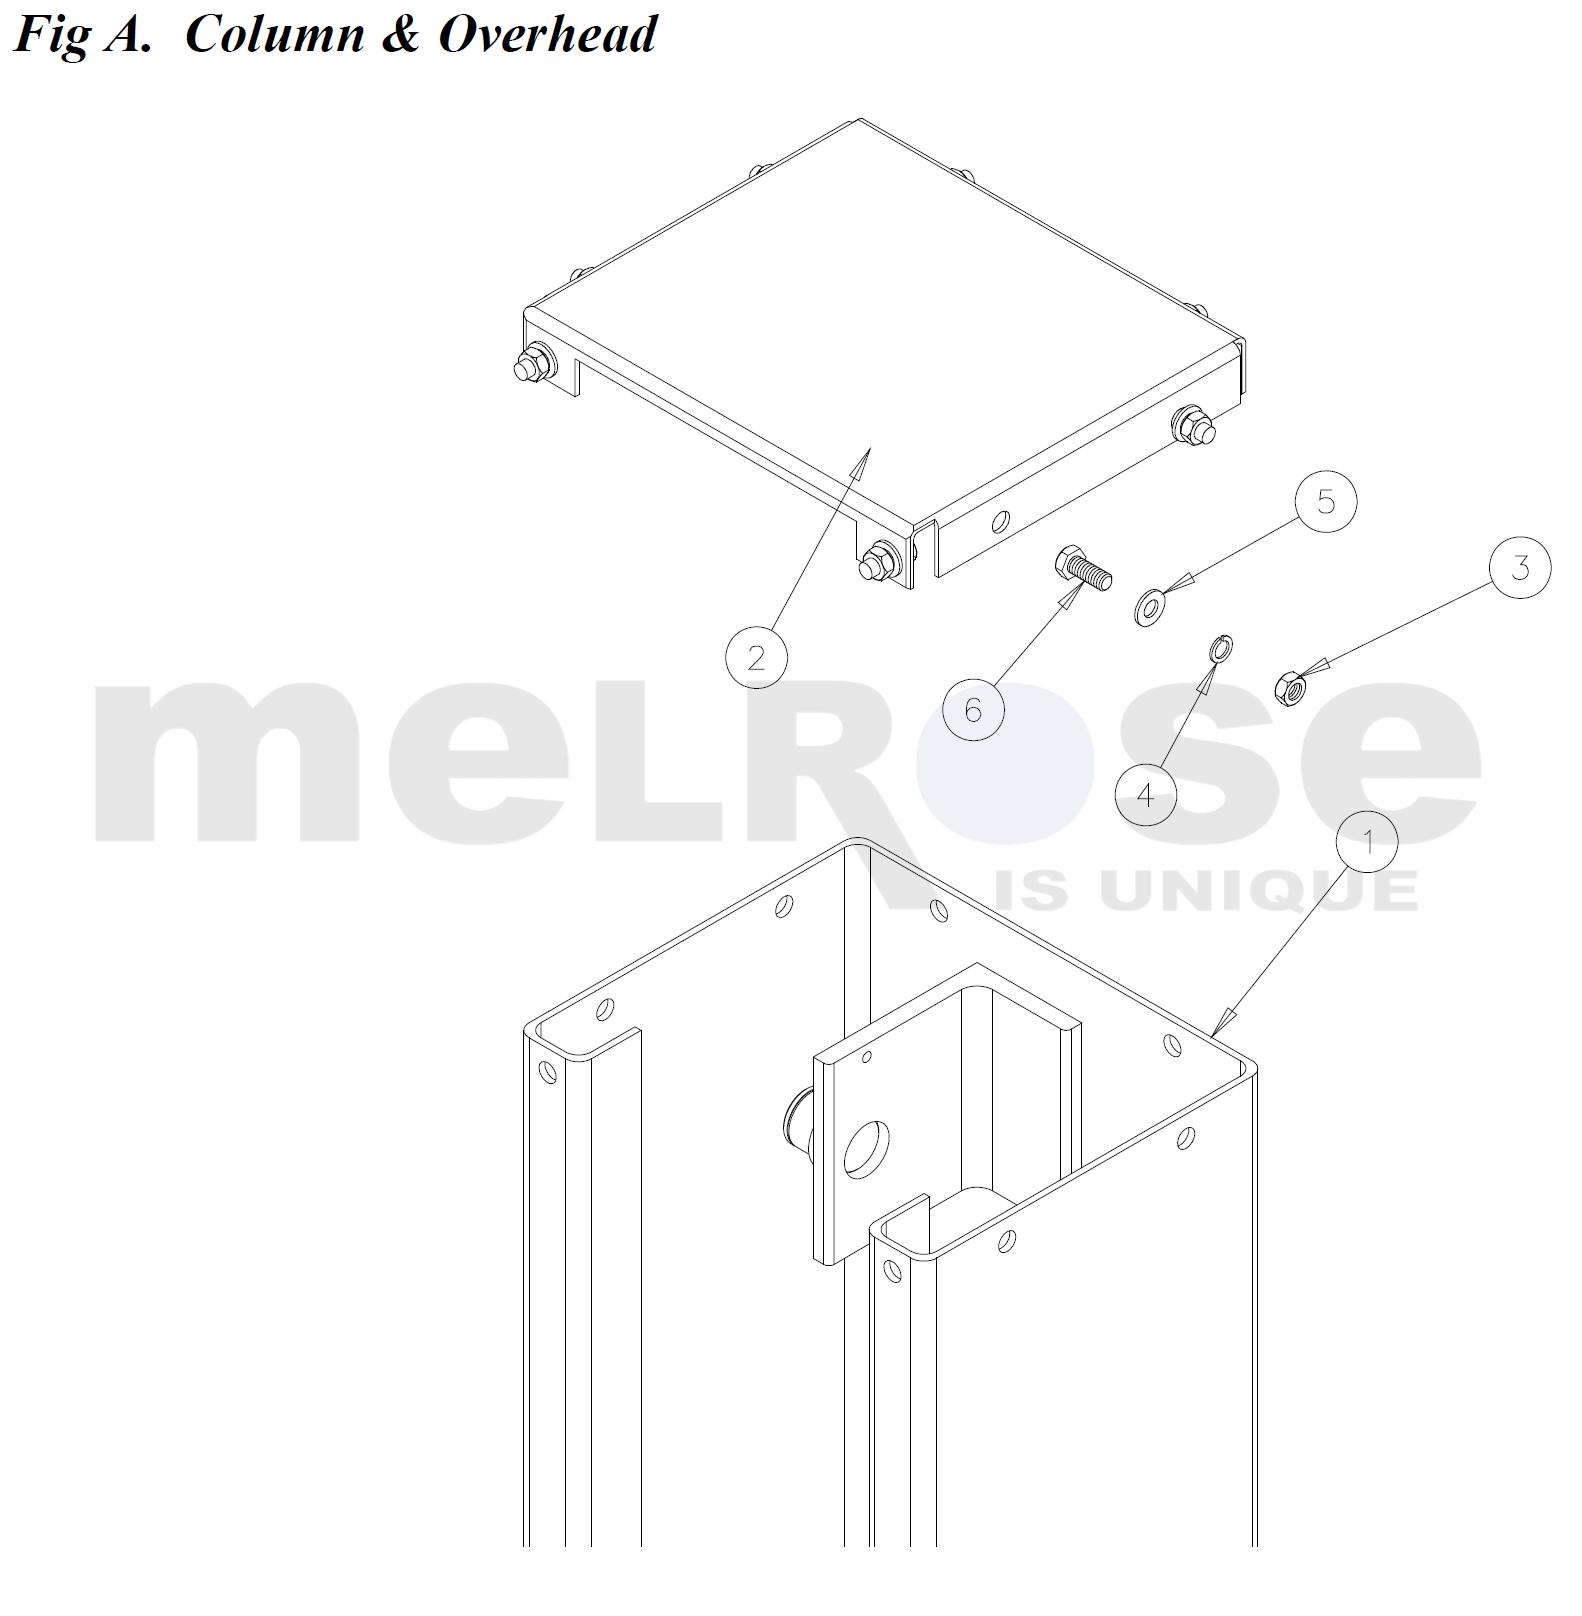 clfp9-column-overhead-diagram-marked.jpg